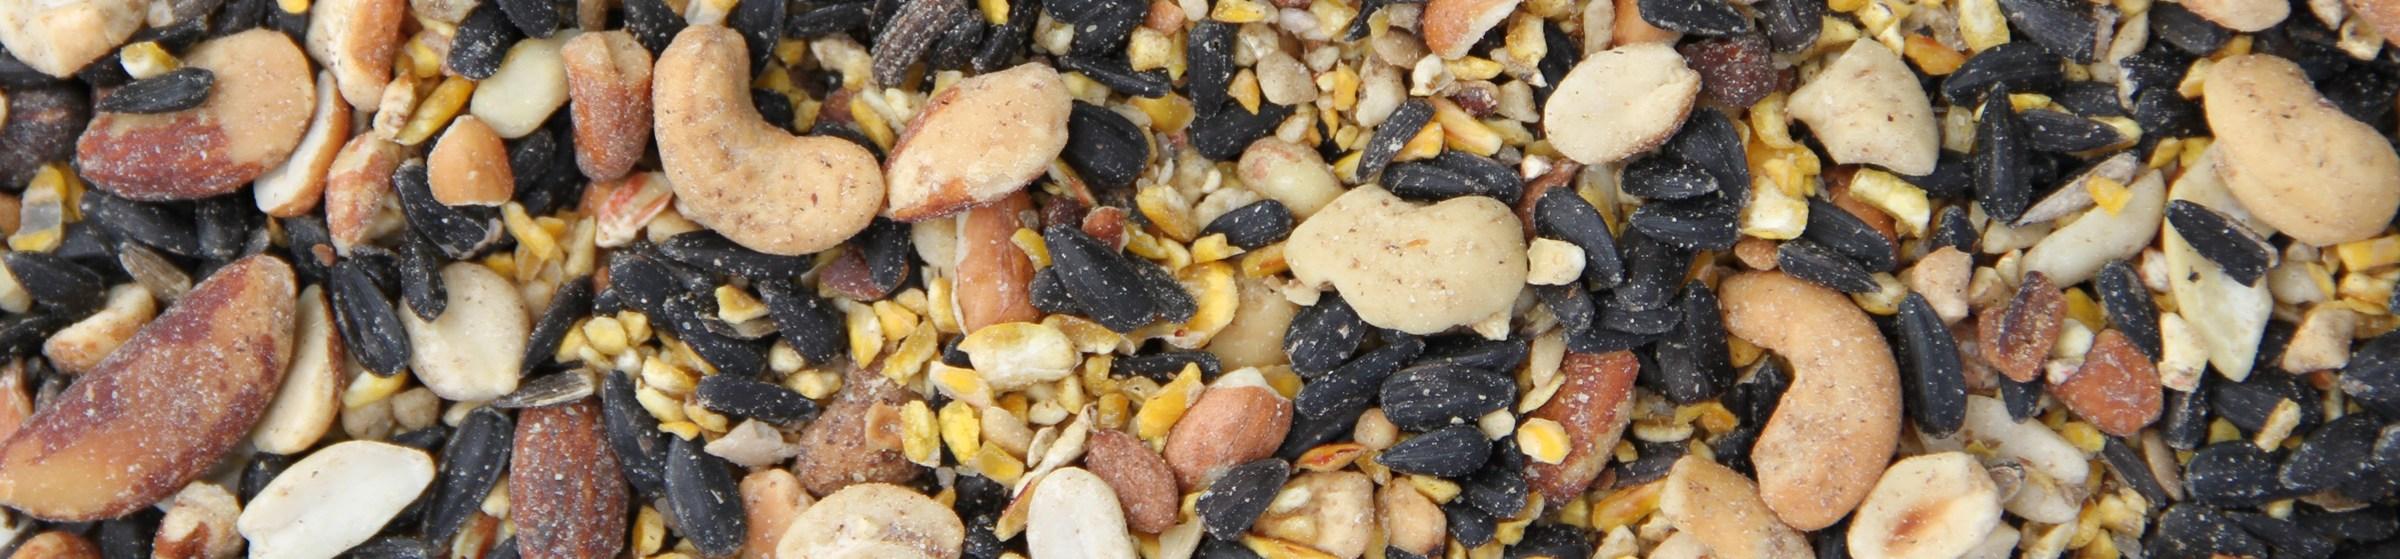 Image of woodpecker wild bird food